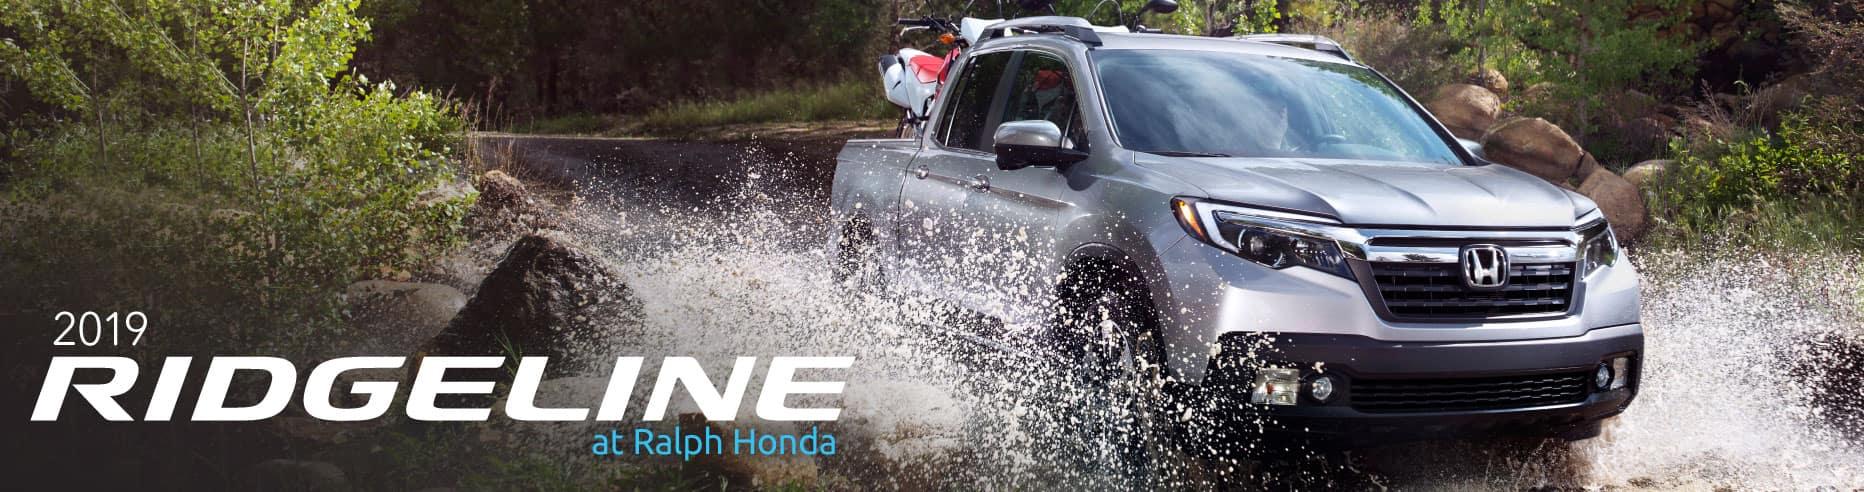 Header Photo of the 2019 Honda Ridgeline